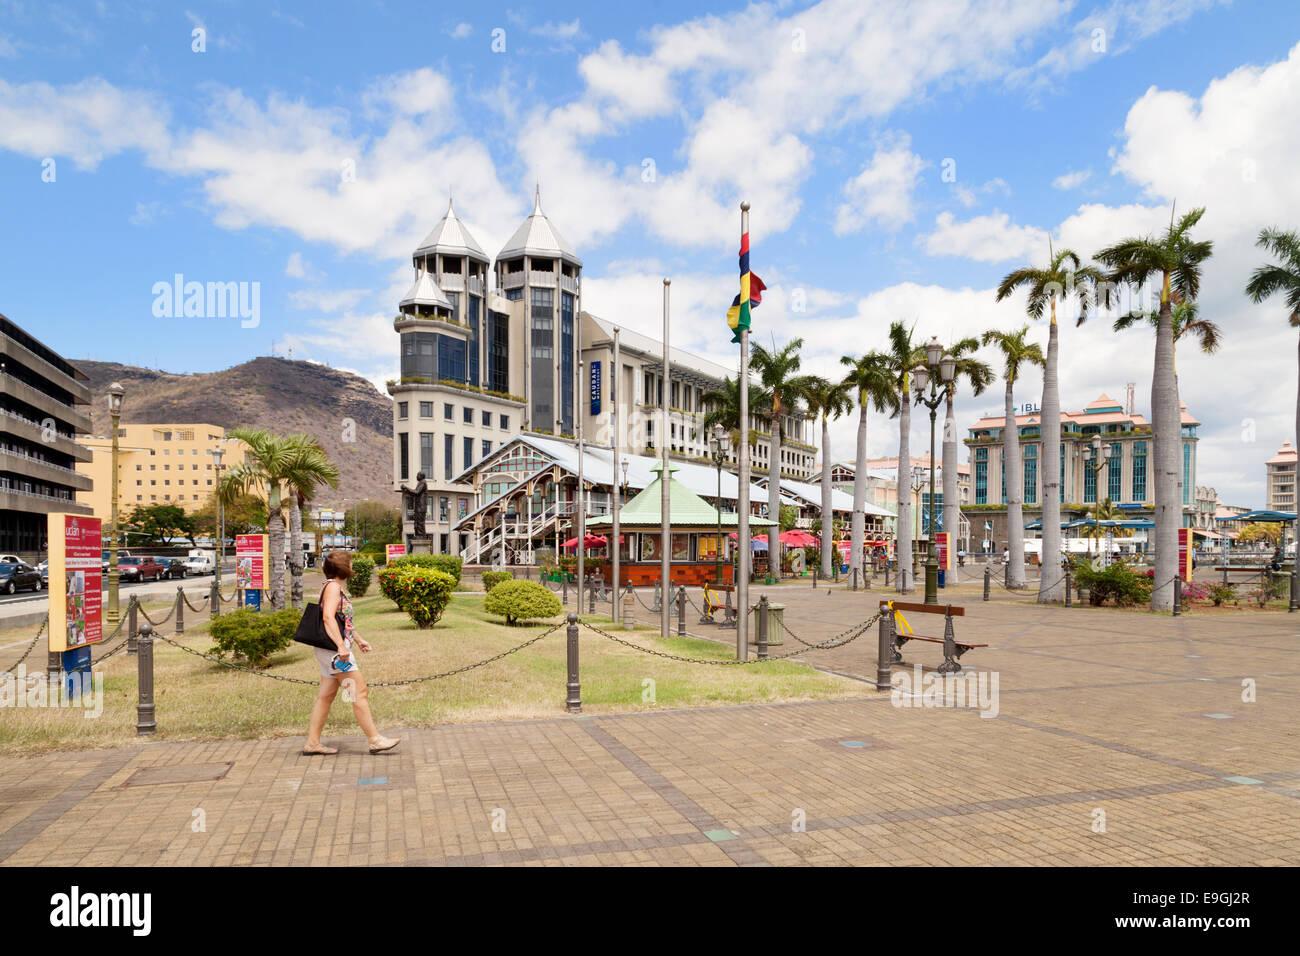 Port louis mauritius photos port louis mauritius images alamy - Restaurant port louis ile maurice ...